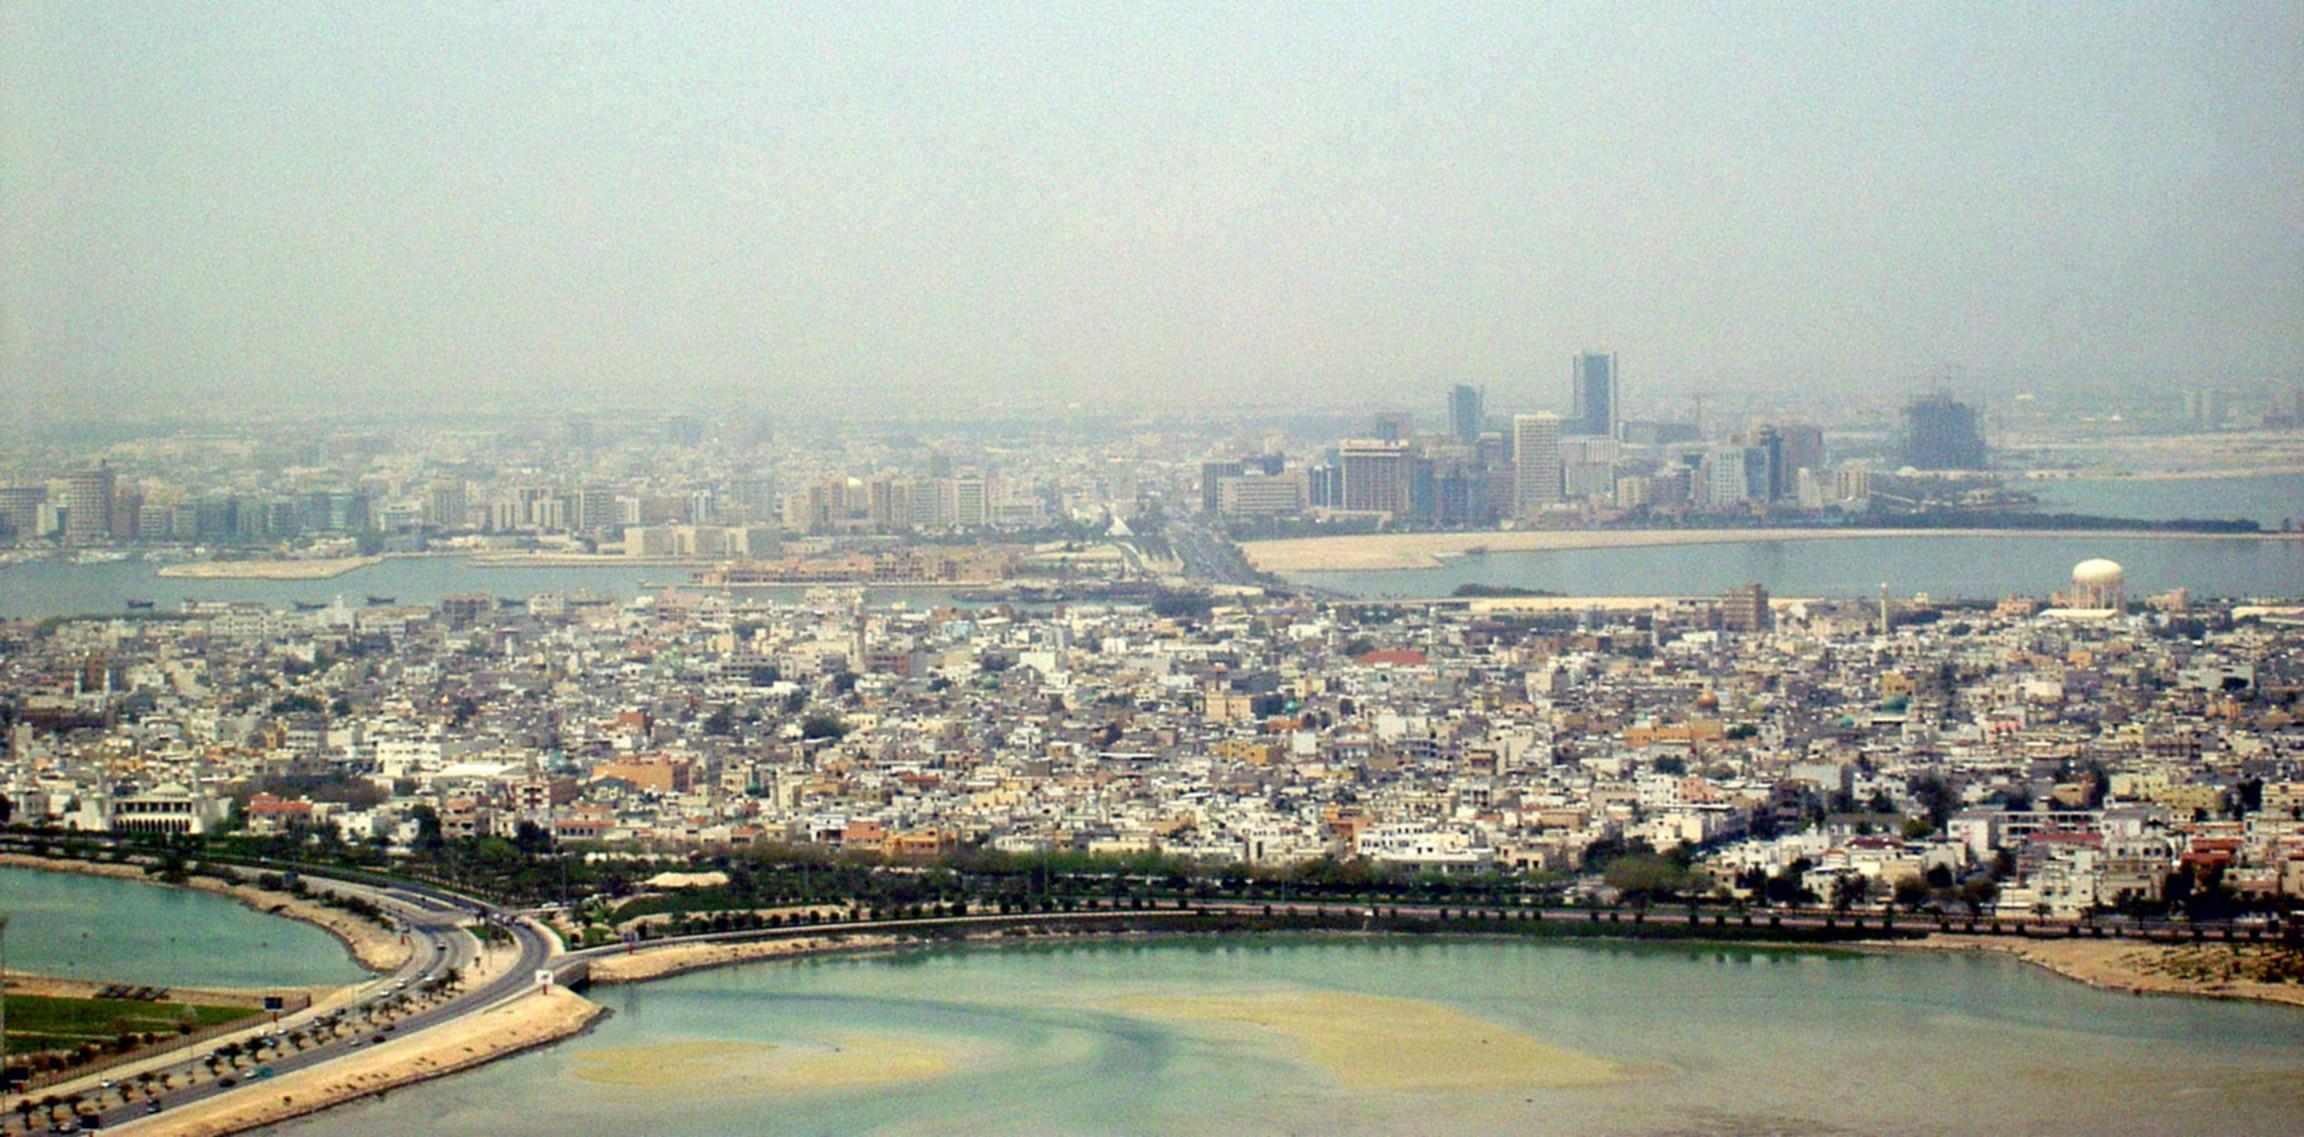 File:Muharraq and Manama.jpg - Wikipedia, the free encyclopedia